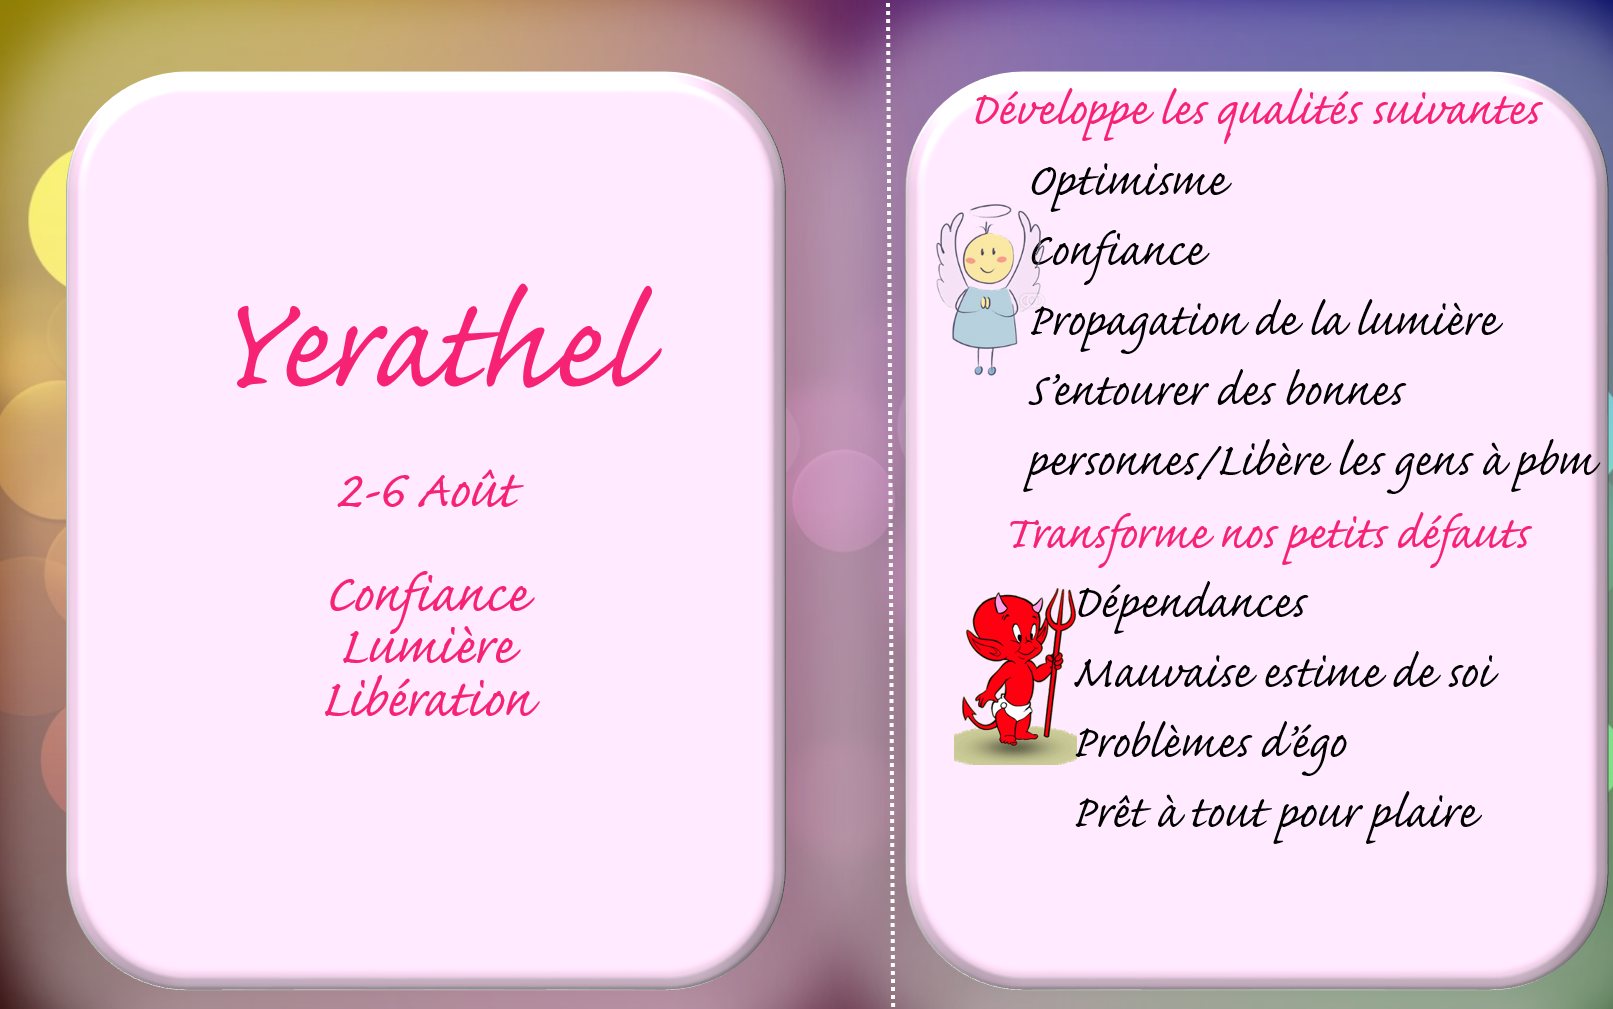 Yerathel